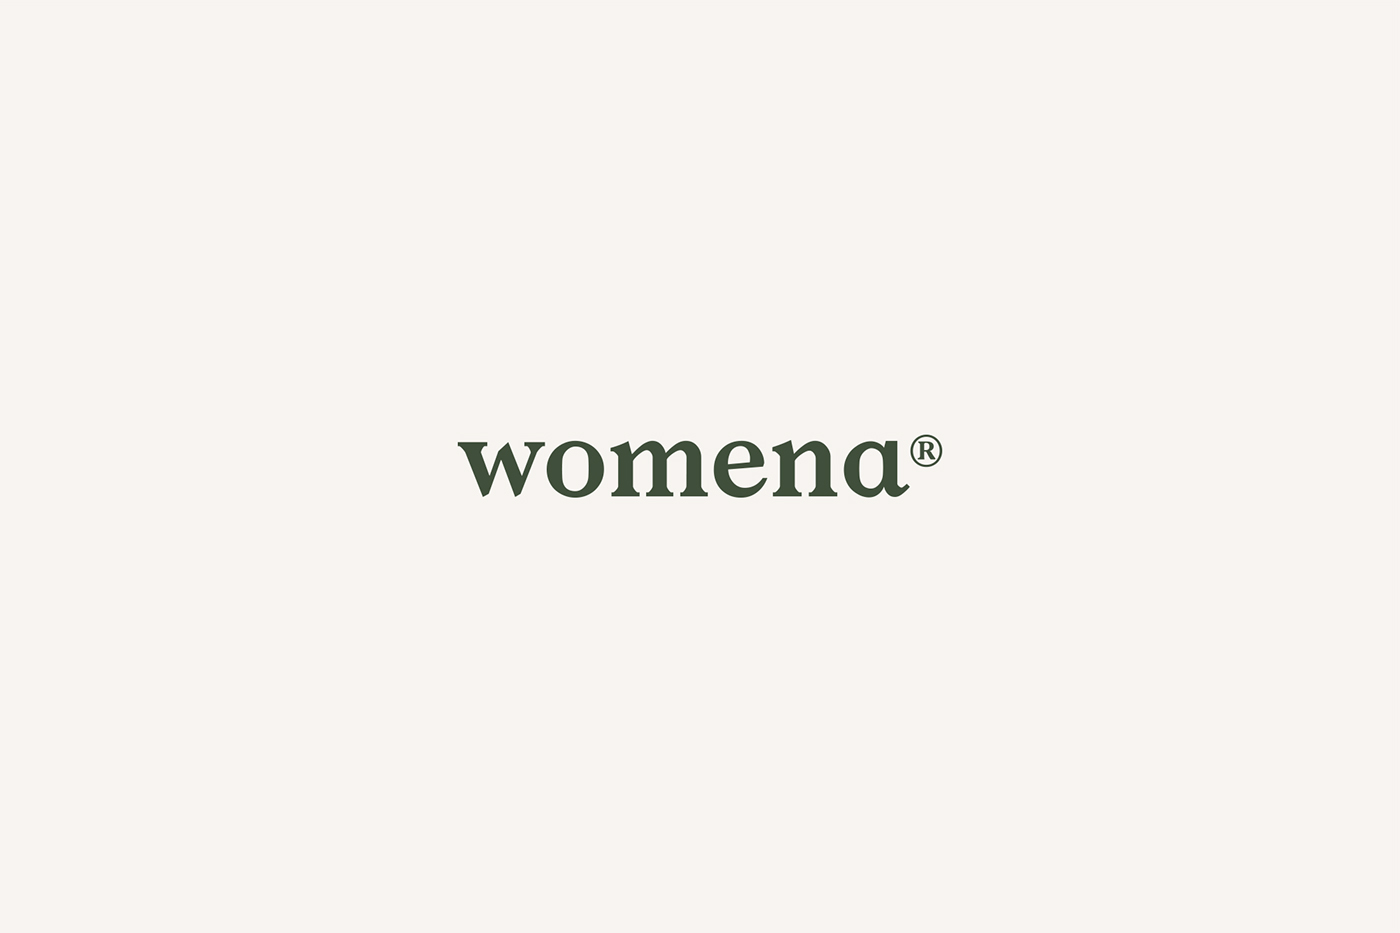 brochure woman circle empowerment dubai rebranding female equality Web gold